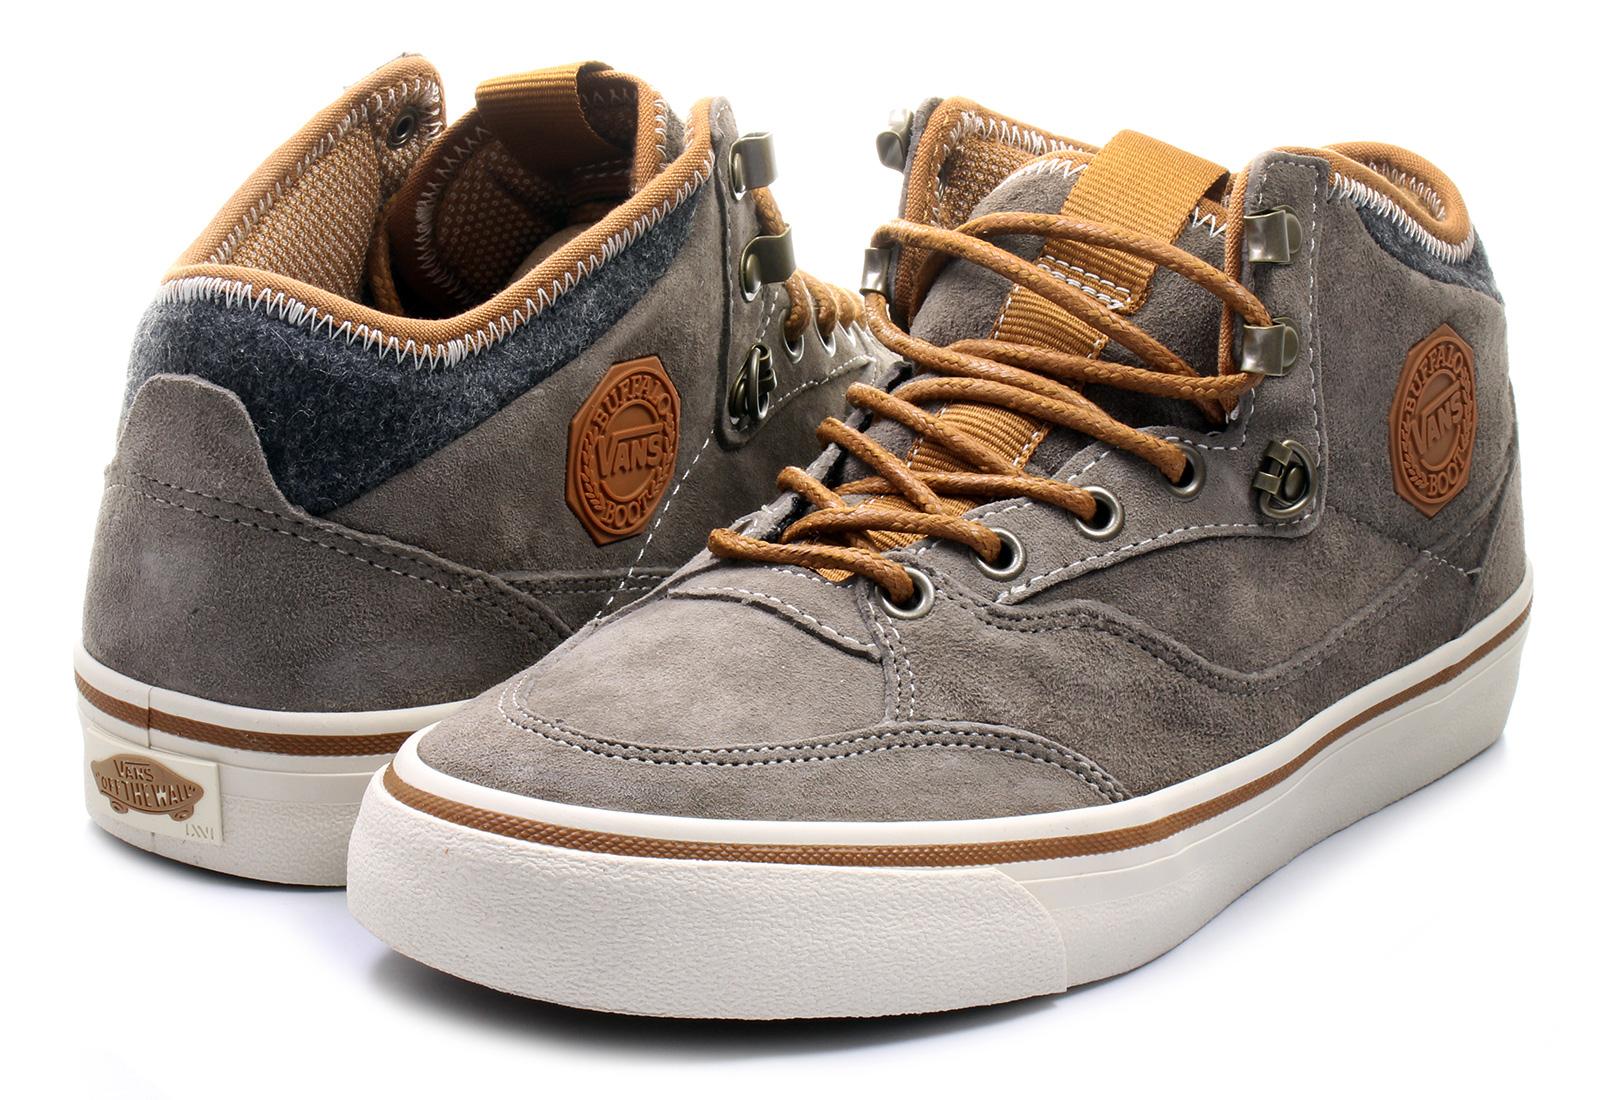 Vans Tornacipő - Buffalo Boot Mte - V183GTC - Office Shoes Magyarország 3ed858b299